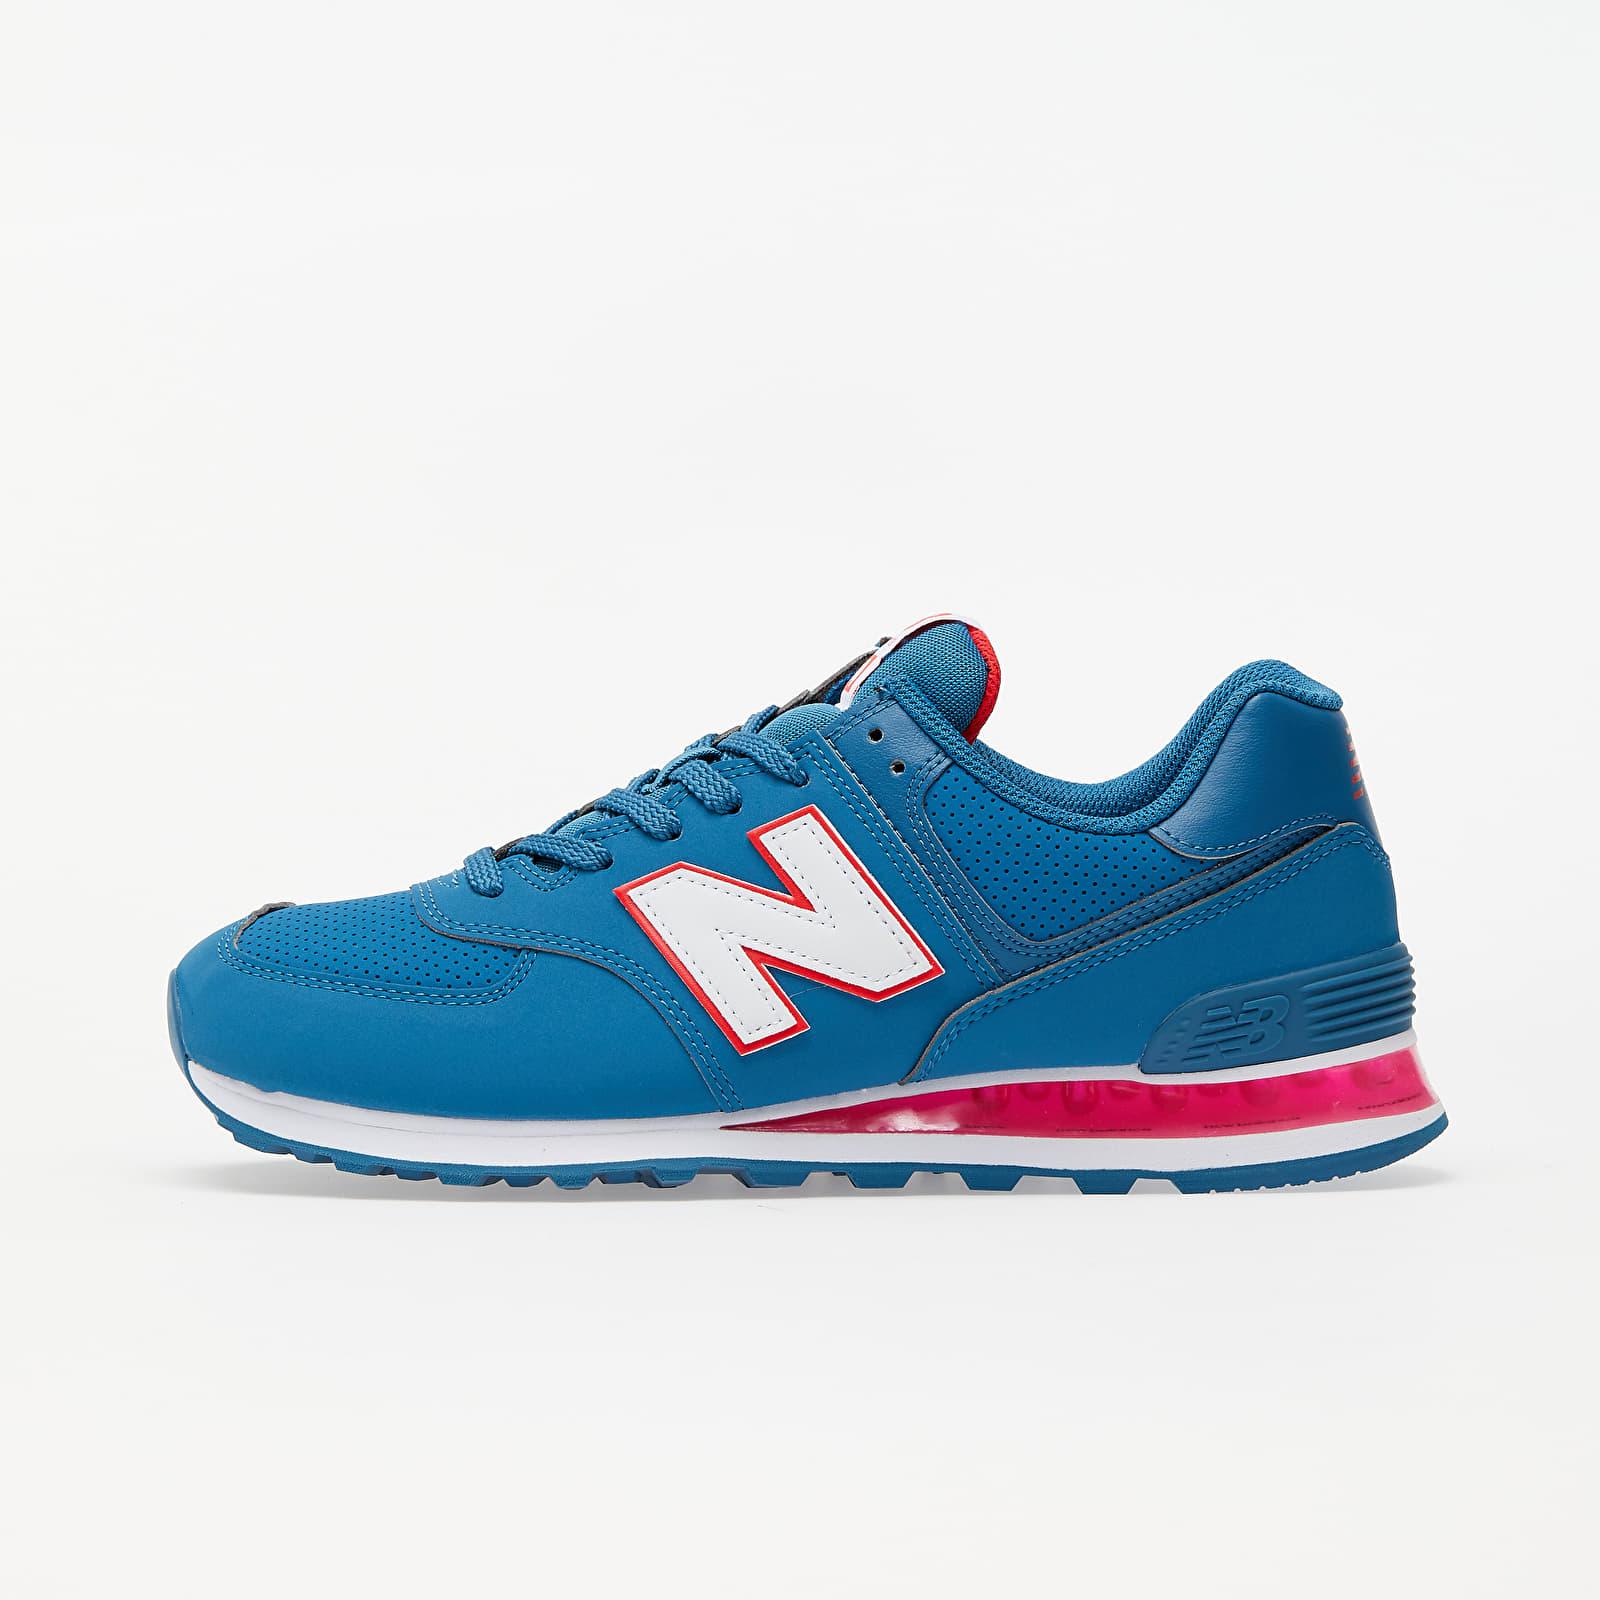 New Balance 574 Blue ML574EWW